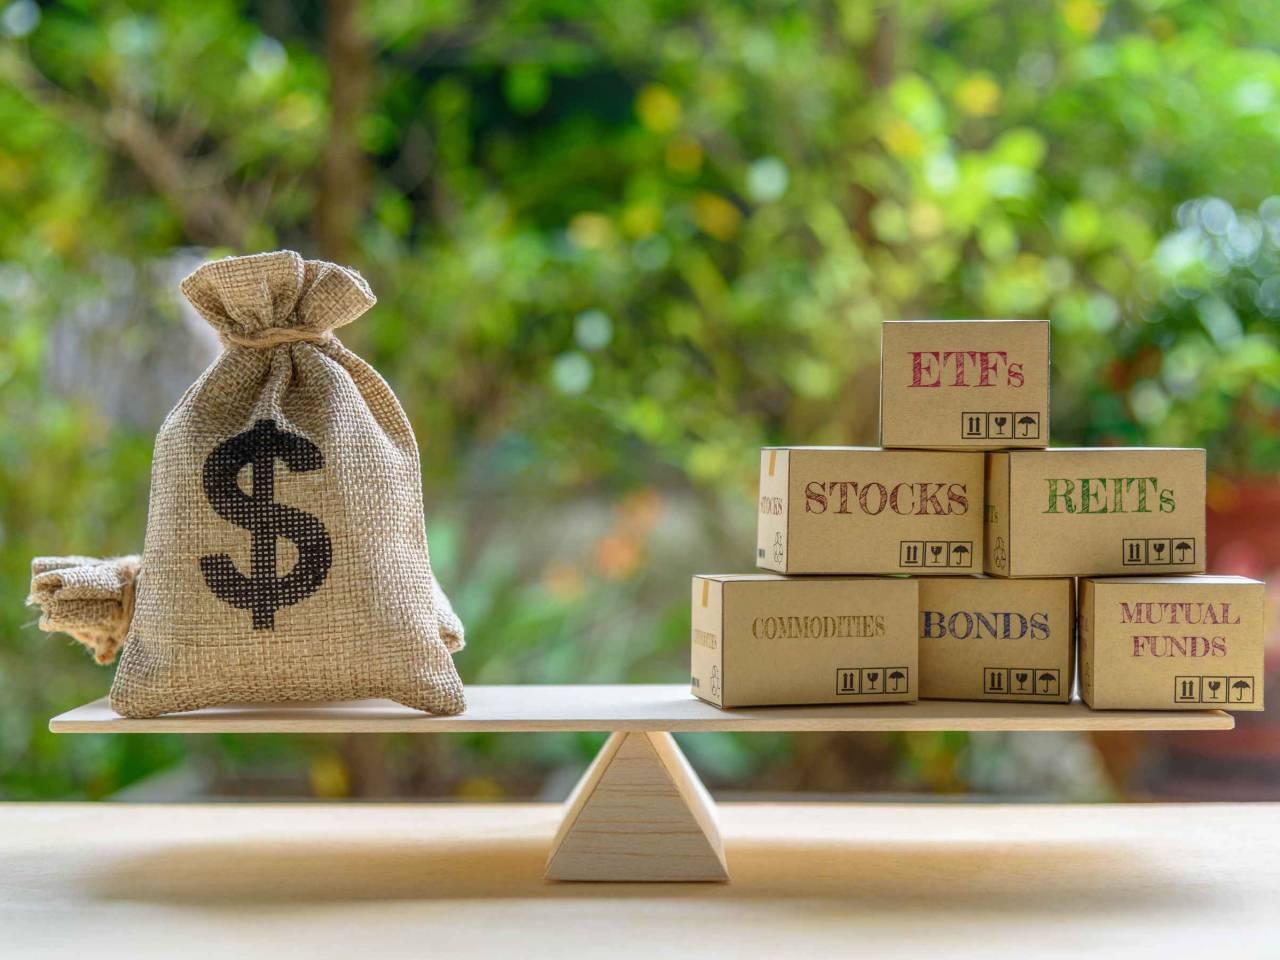 Portfolio management and asset allocation concept